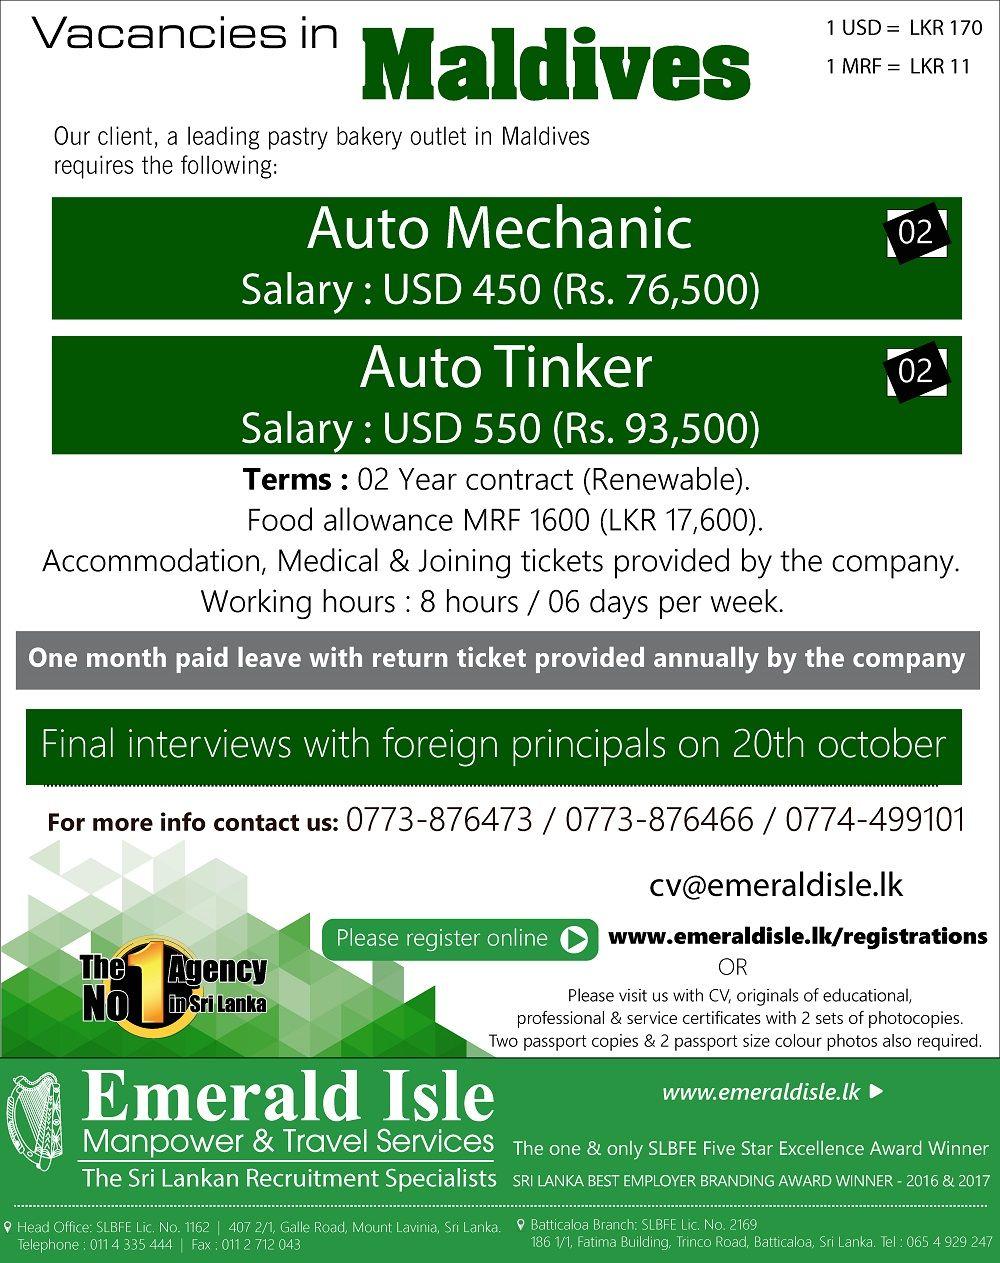 Emerald Isle Manpower - Home | Facebook